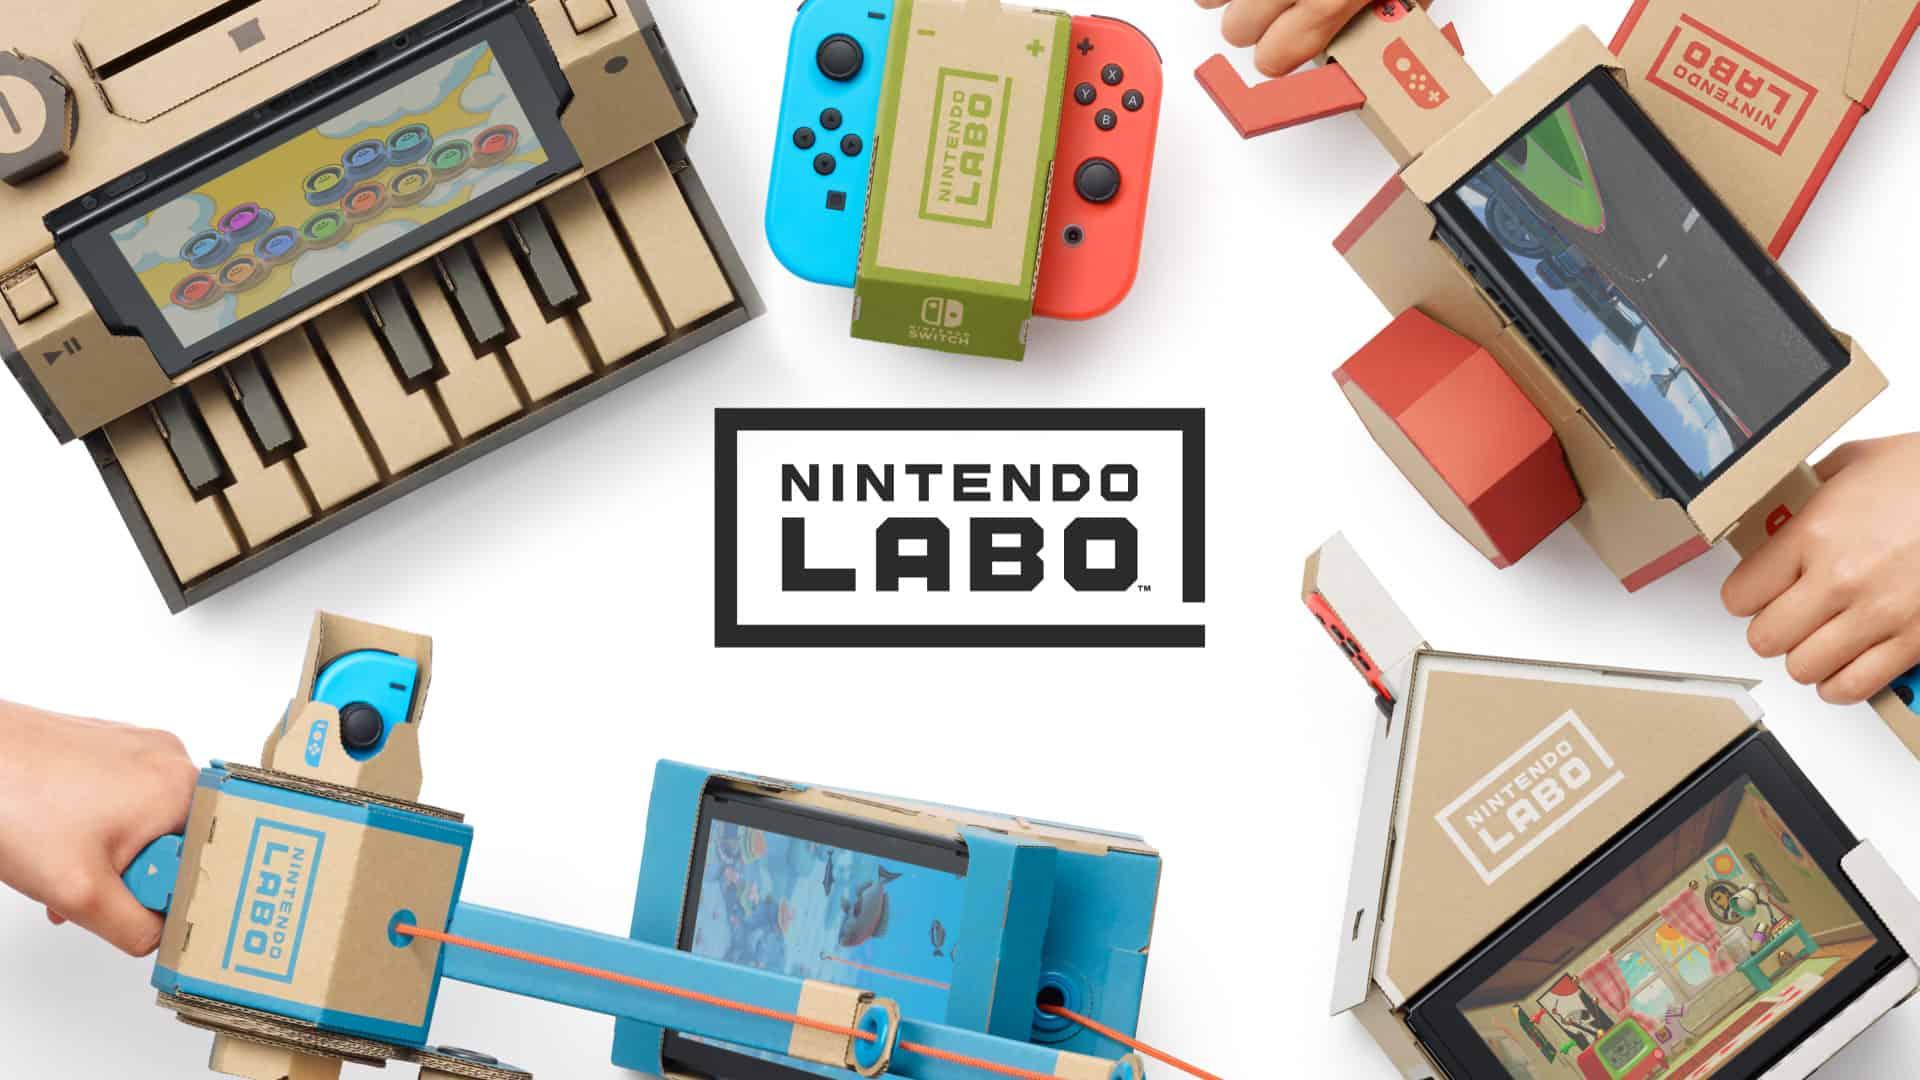 nintendo labo 1 - Nintendo Labo: La Nintendo Difference colpisce ancora?